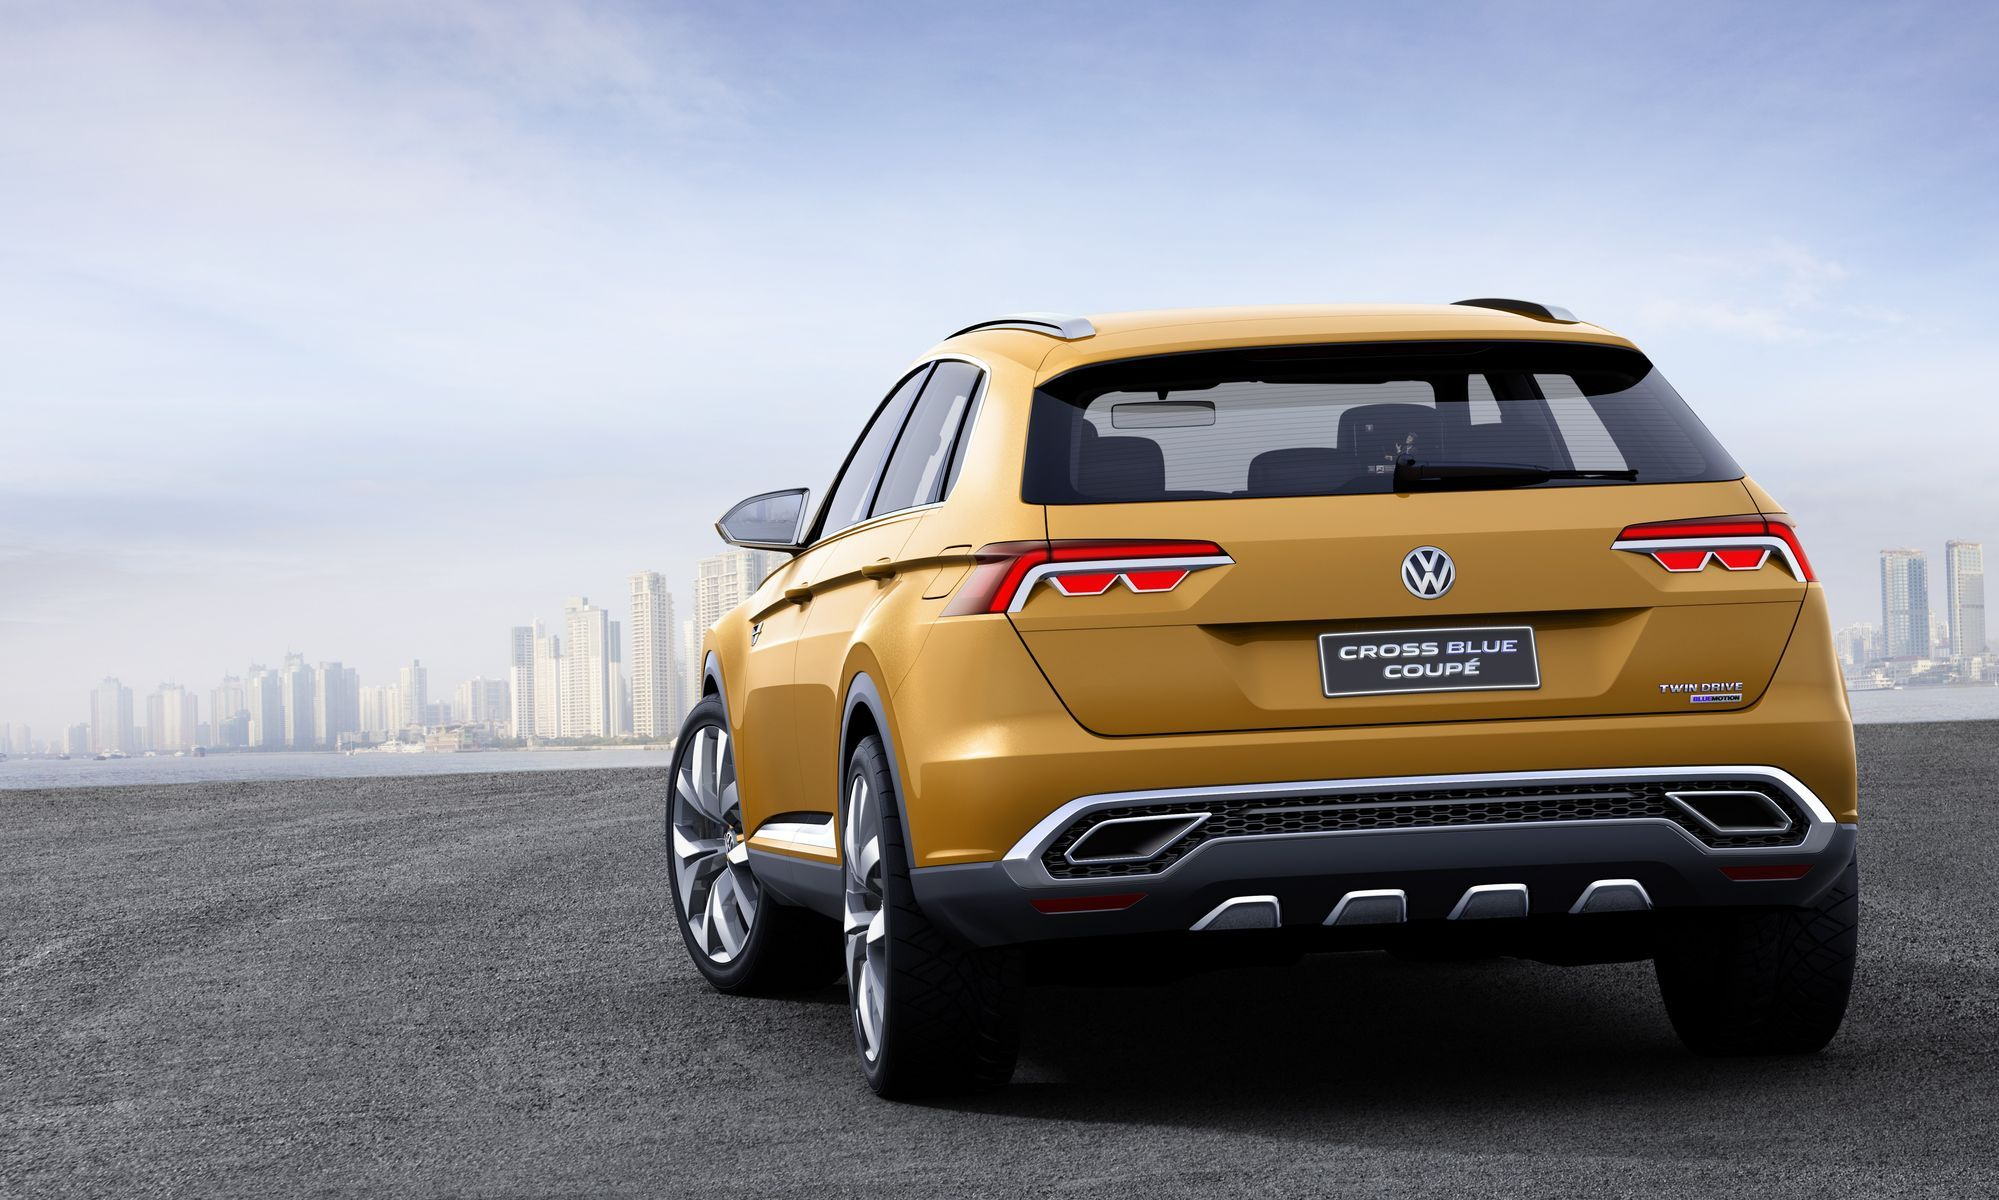 Volkswagen  | VW Cross Blue Coupe Concept